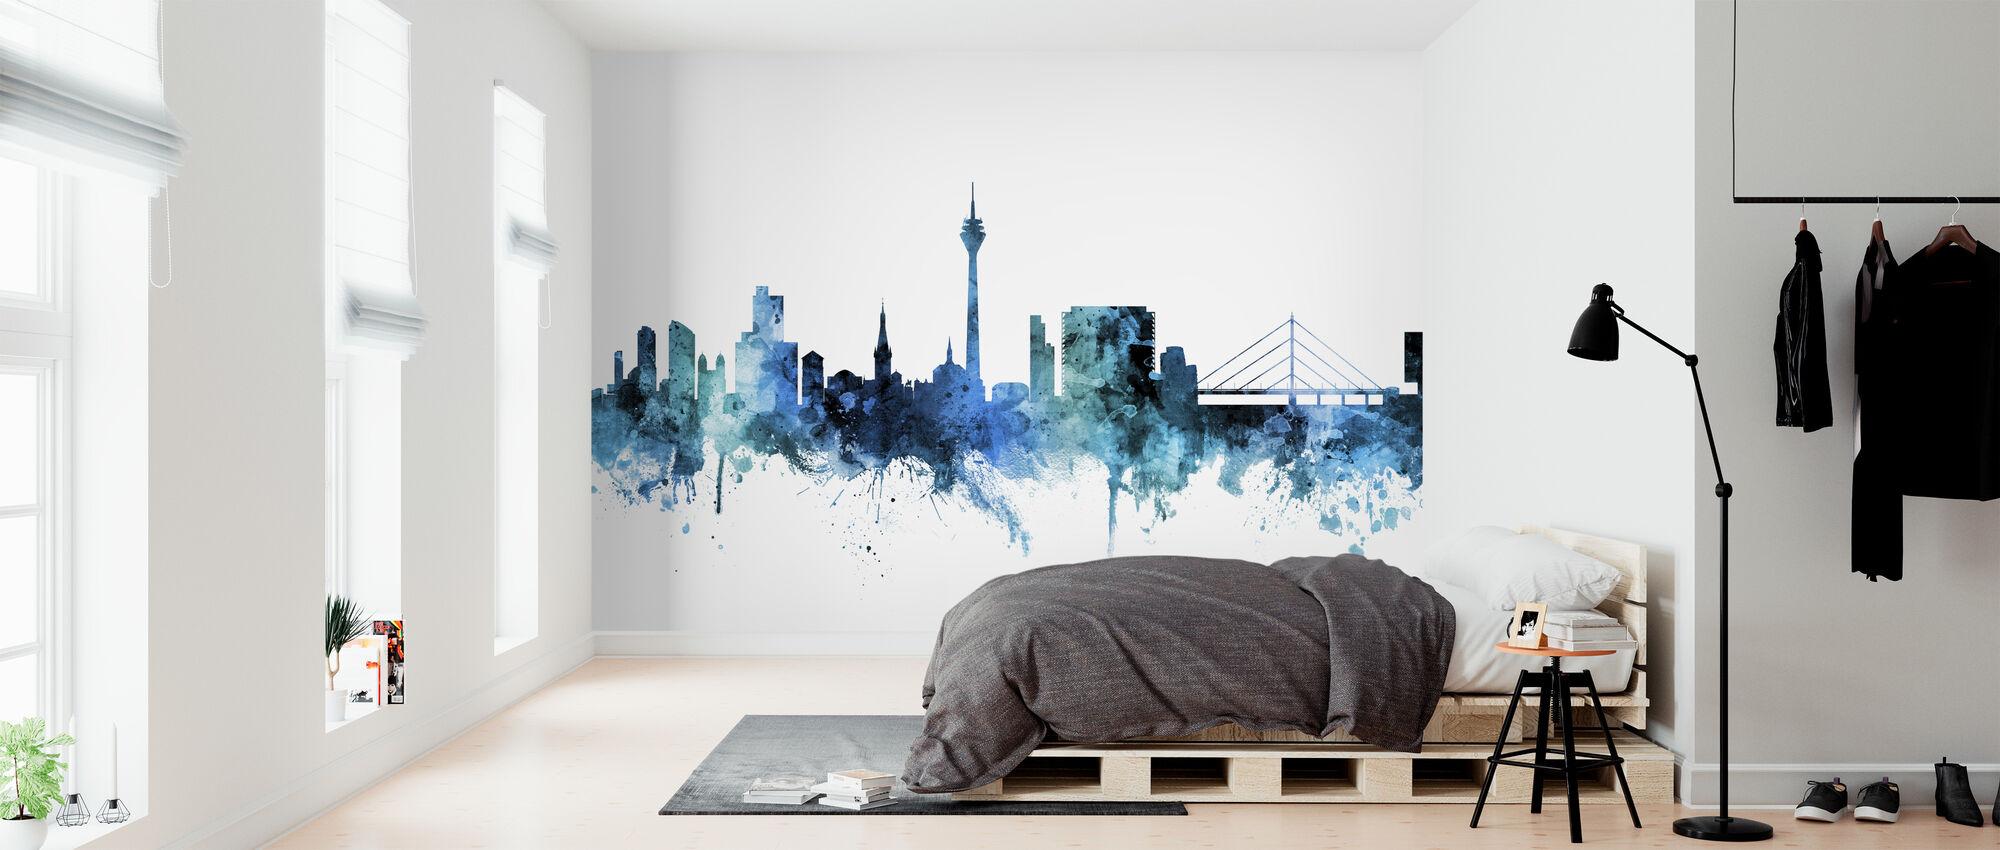 Dusseldorf Germany Skyline - Wallpaper - Bedroom